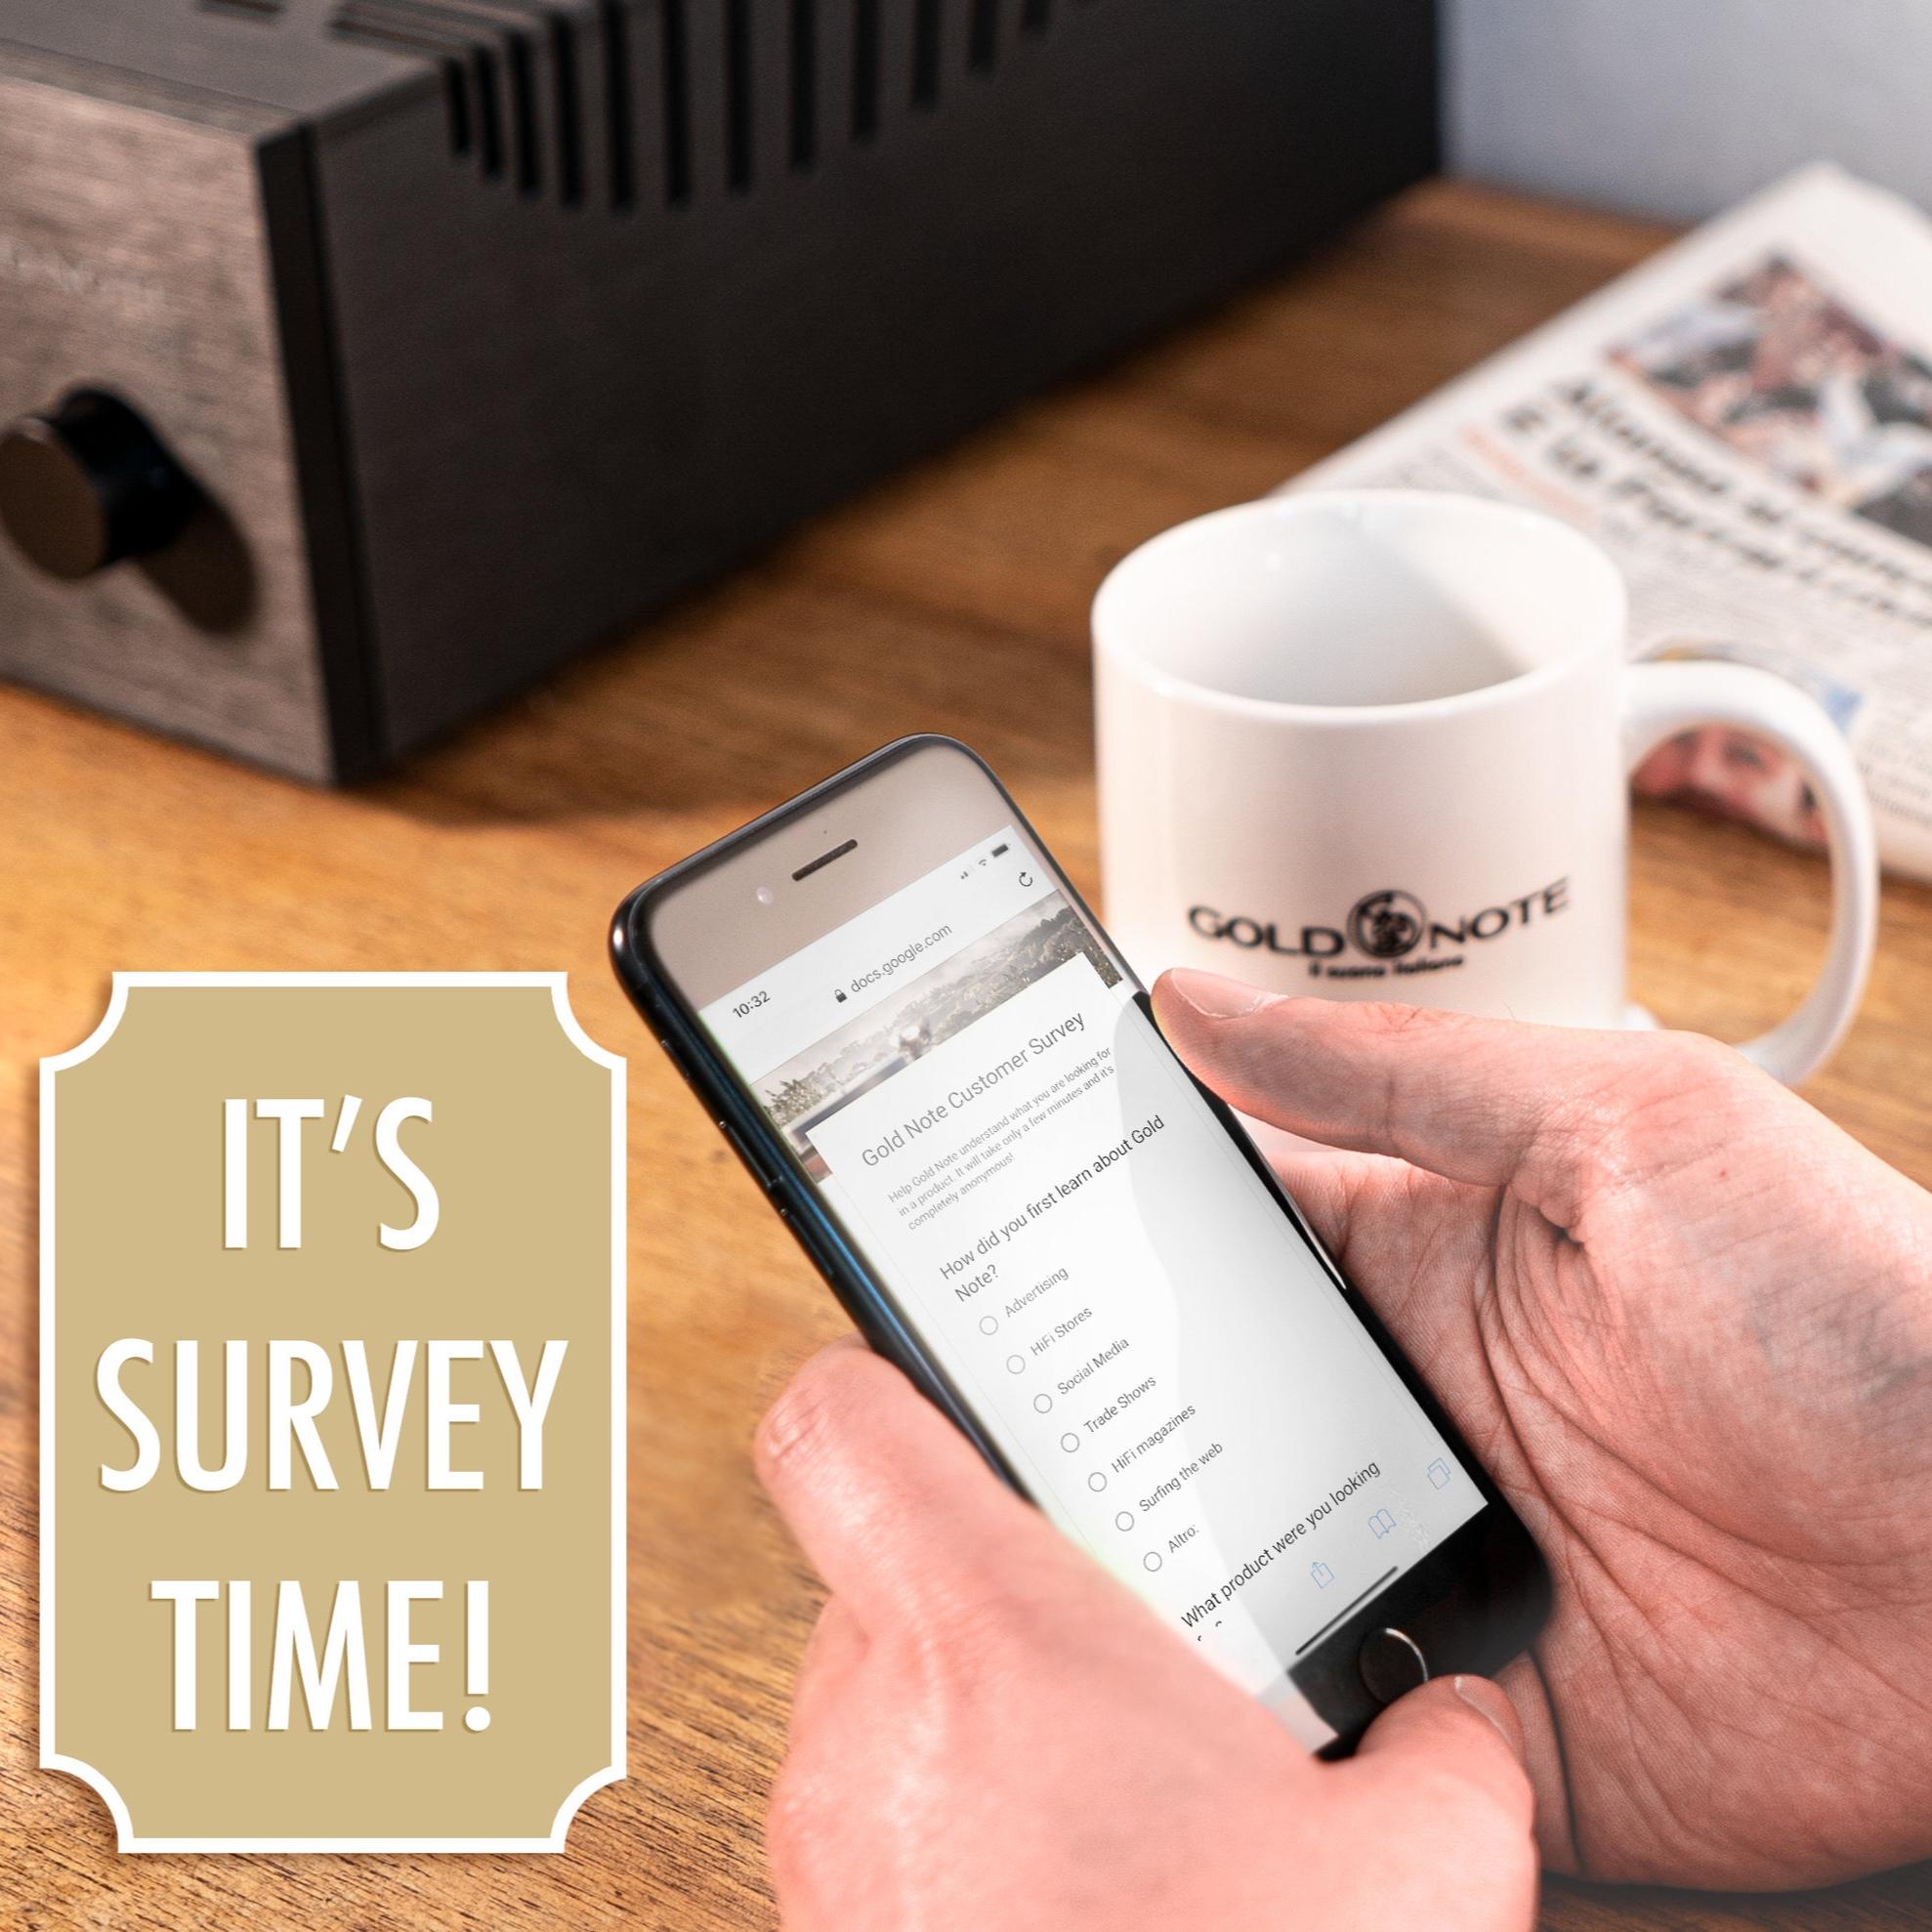 ....Participate in our online survey..Partecipi al nostro questionnaire.... - ....Tell us what you think about our products. It's completely anonymous and takes only a few minutes! THANK YOU!..Raccontaci cosa ne pensi dei nostri prodotti. E completamente anonimo e ci vuole solo un attimo. Grazie!....To the survey..Vai al sondaggio https://forms.gle/cqfQZLHuK9R3DHxaA....